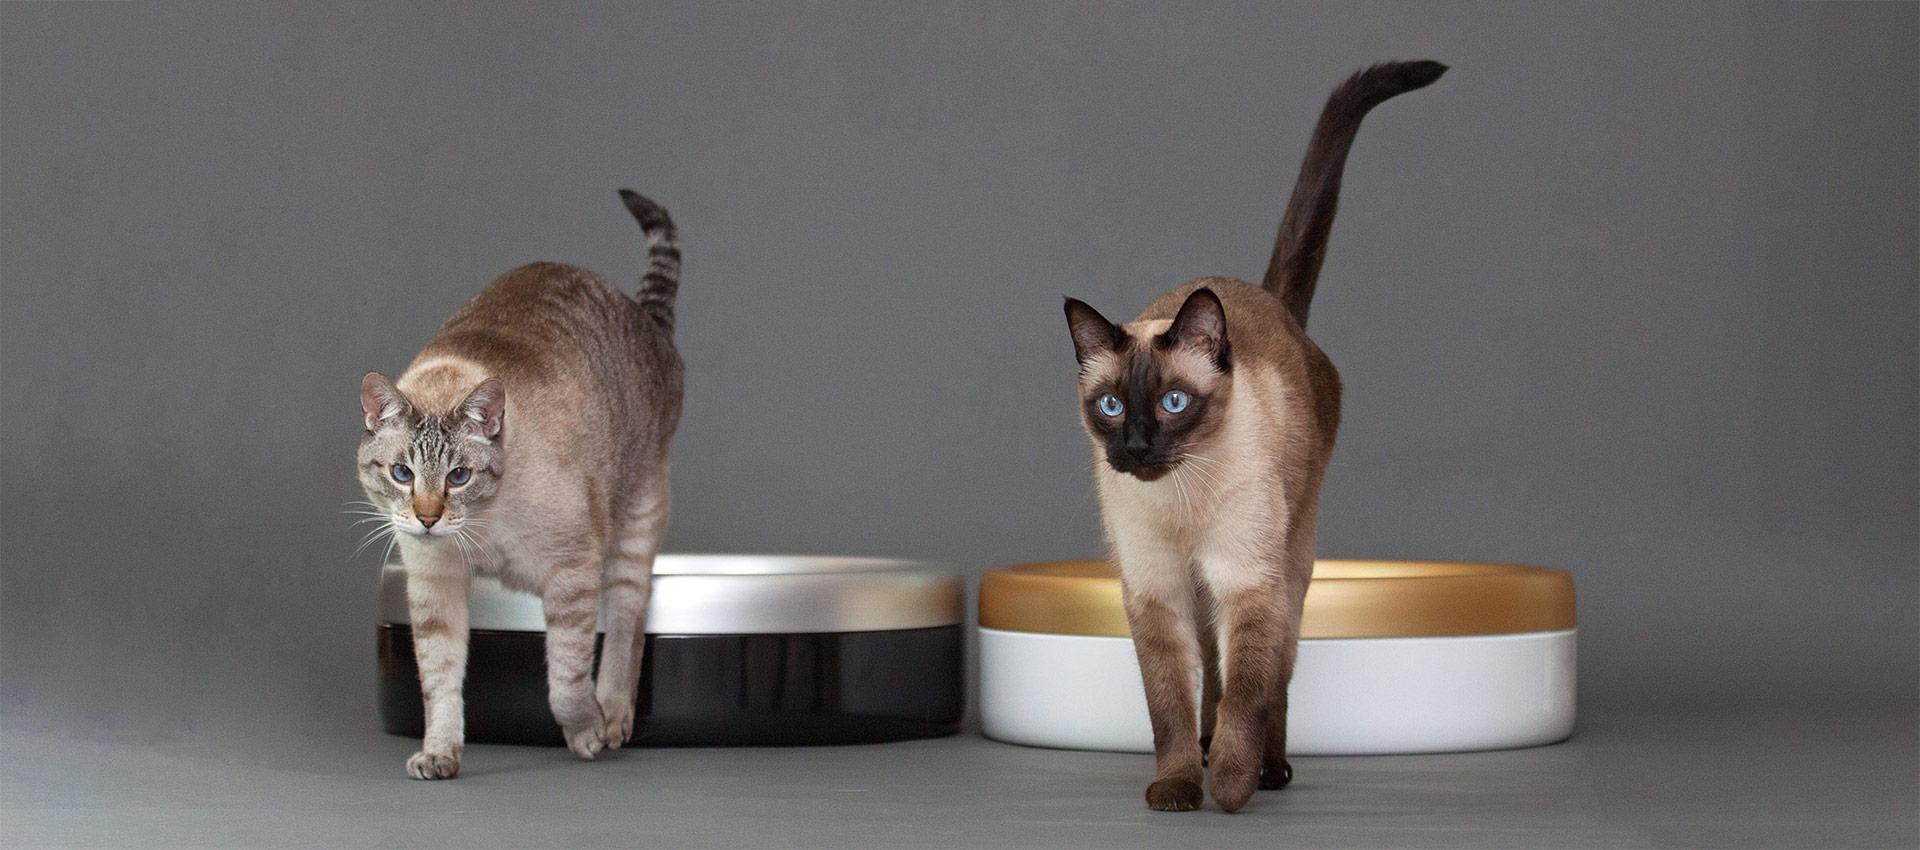 katchit-katzentoilette-kratzfest-geruchlos-cat-litter-box-Emaille-odorless-hygienic-scratch-resistant-zgi-ojok